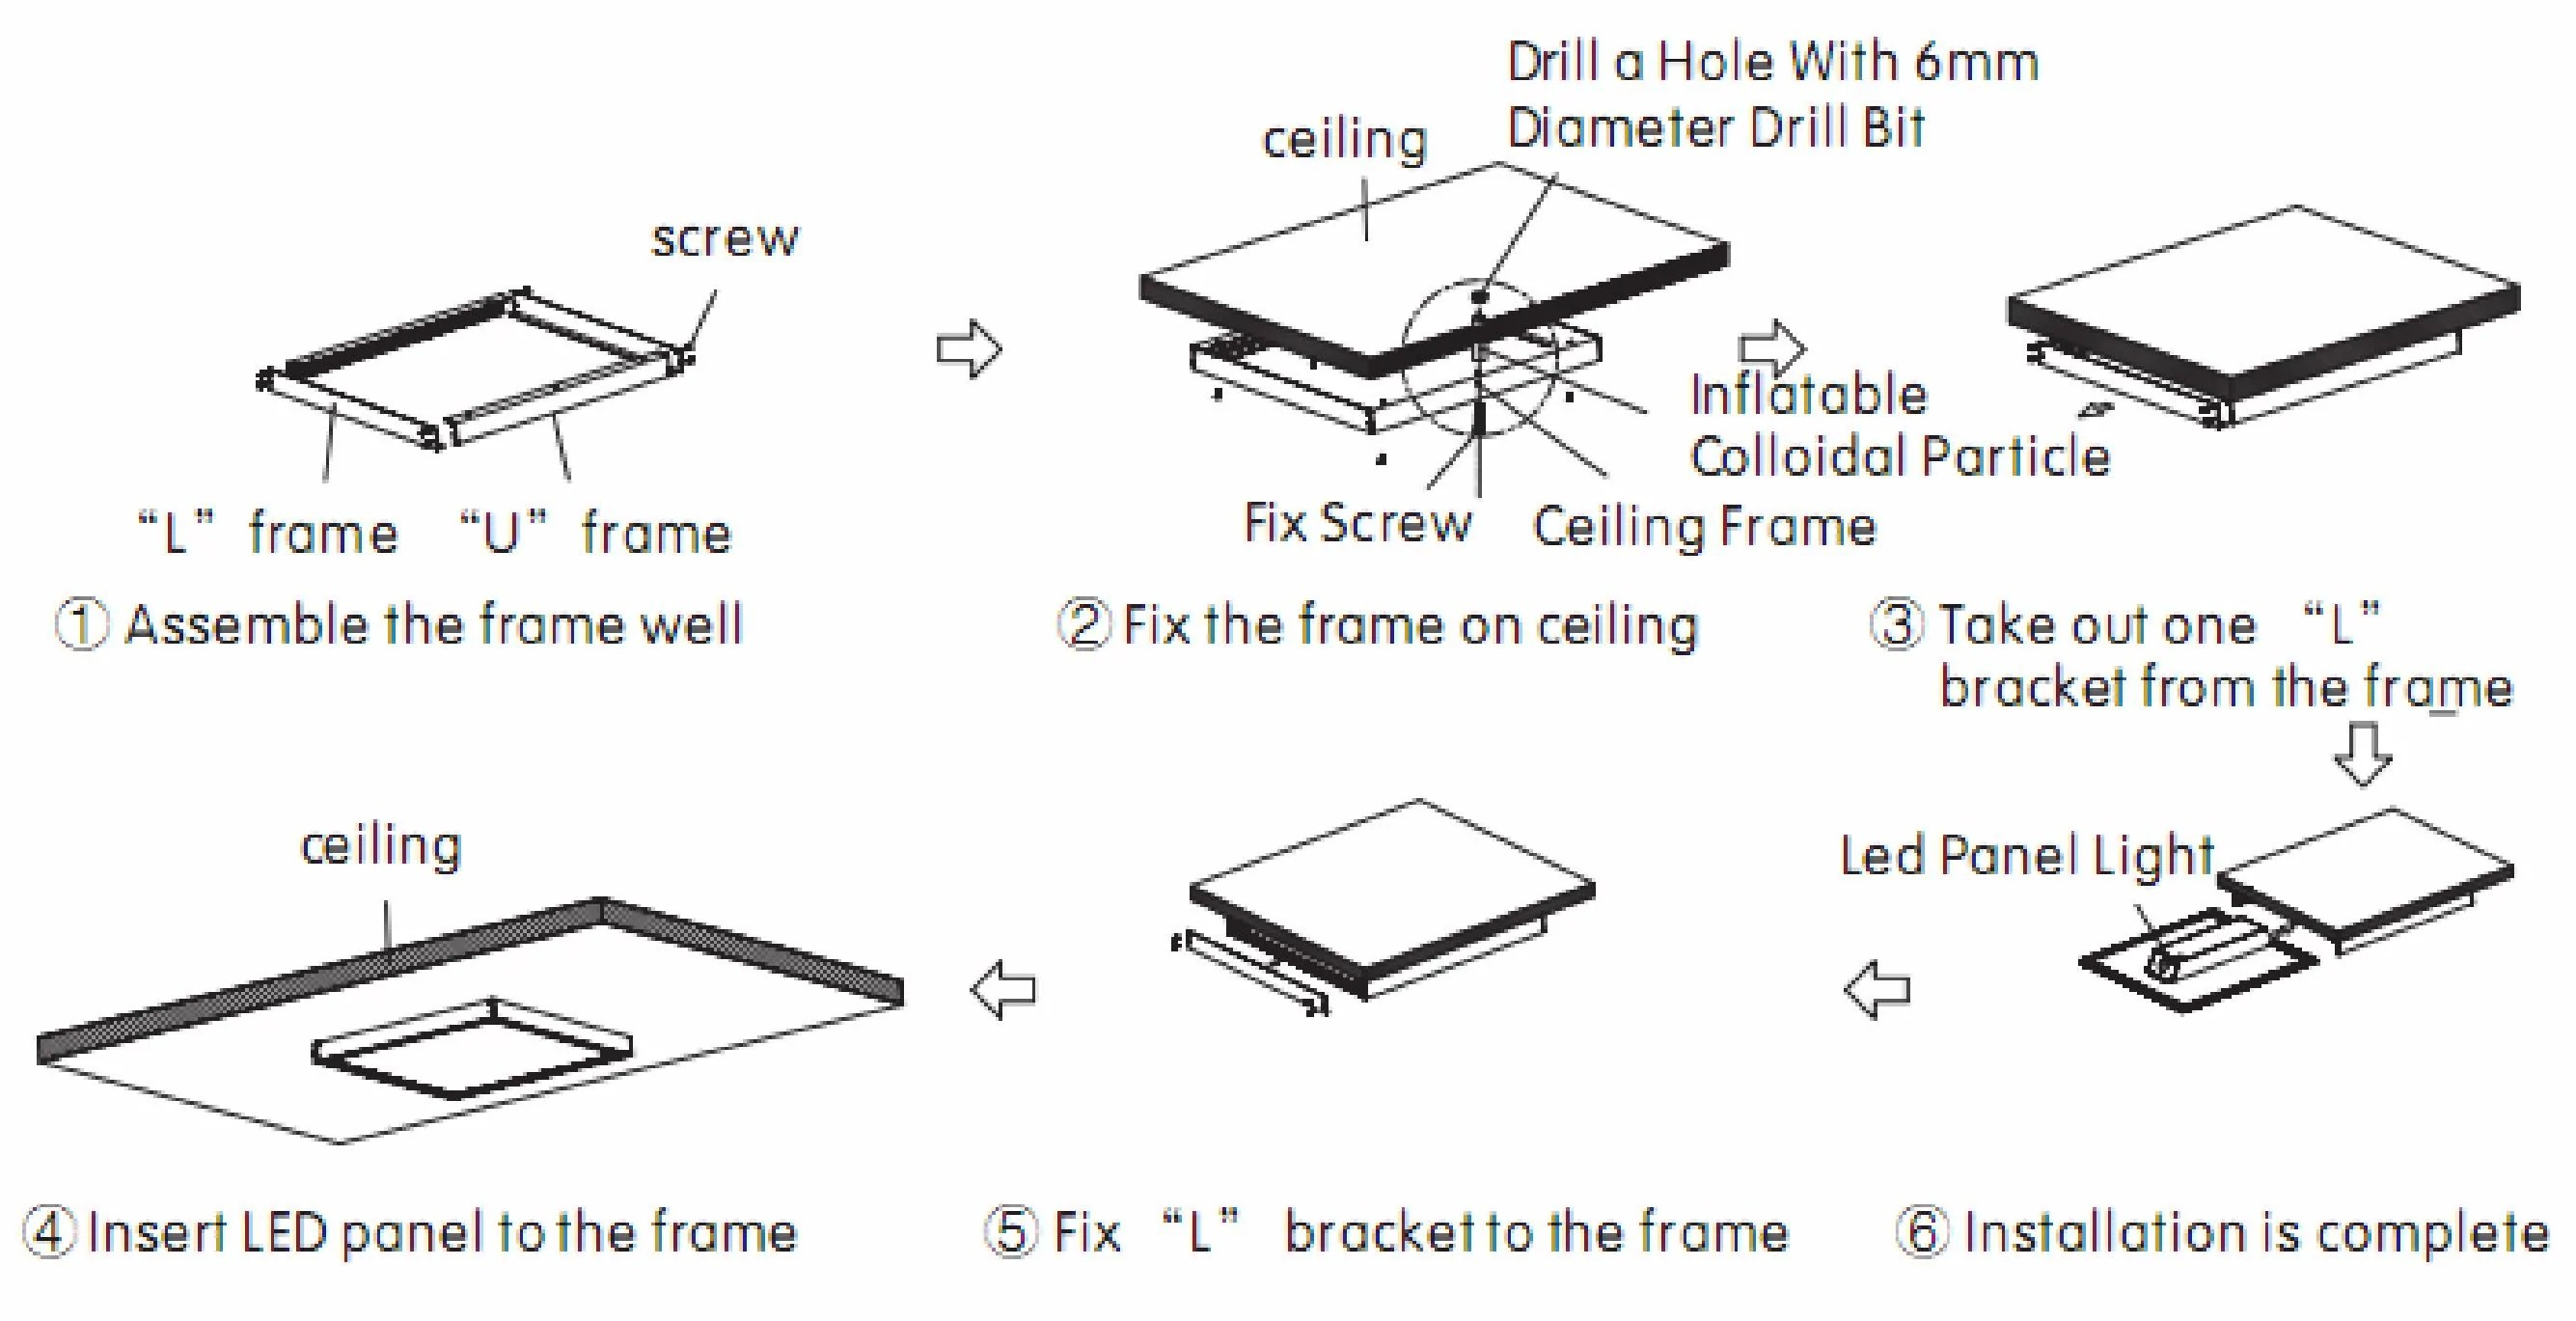 medium resolution of led panel diagram data wiring diagramsled panel diagram schema wiring diagram led photocell diagram led panel